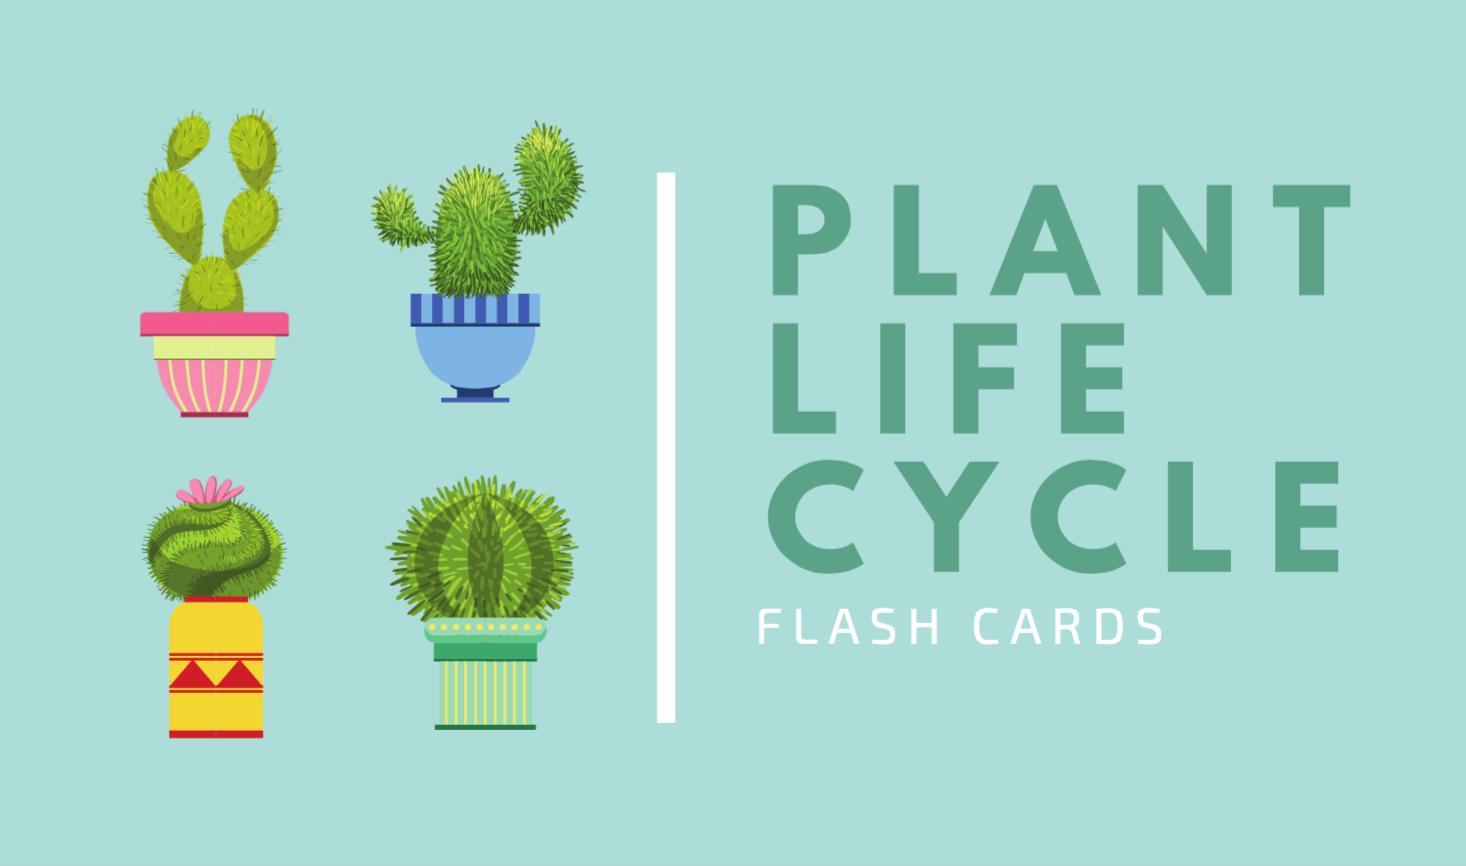 Free Online Flashcard Maker: Design Custom Flashcards - Canva - Free Printable Flash Card Maker Online